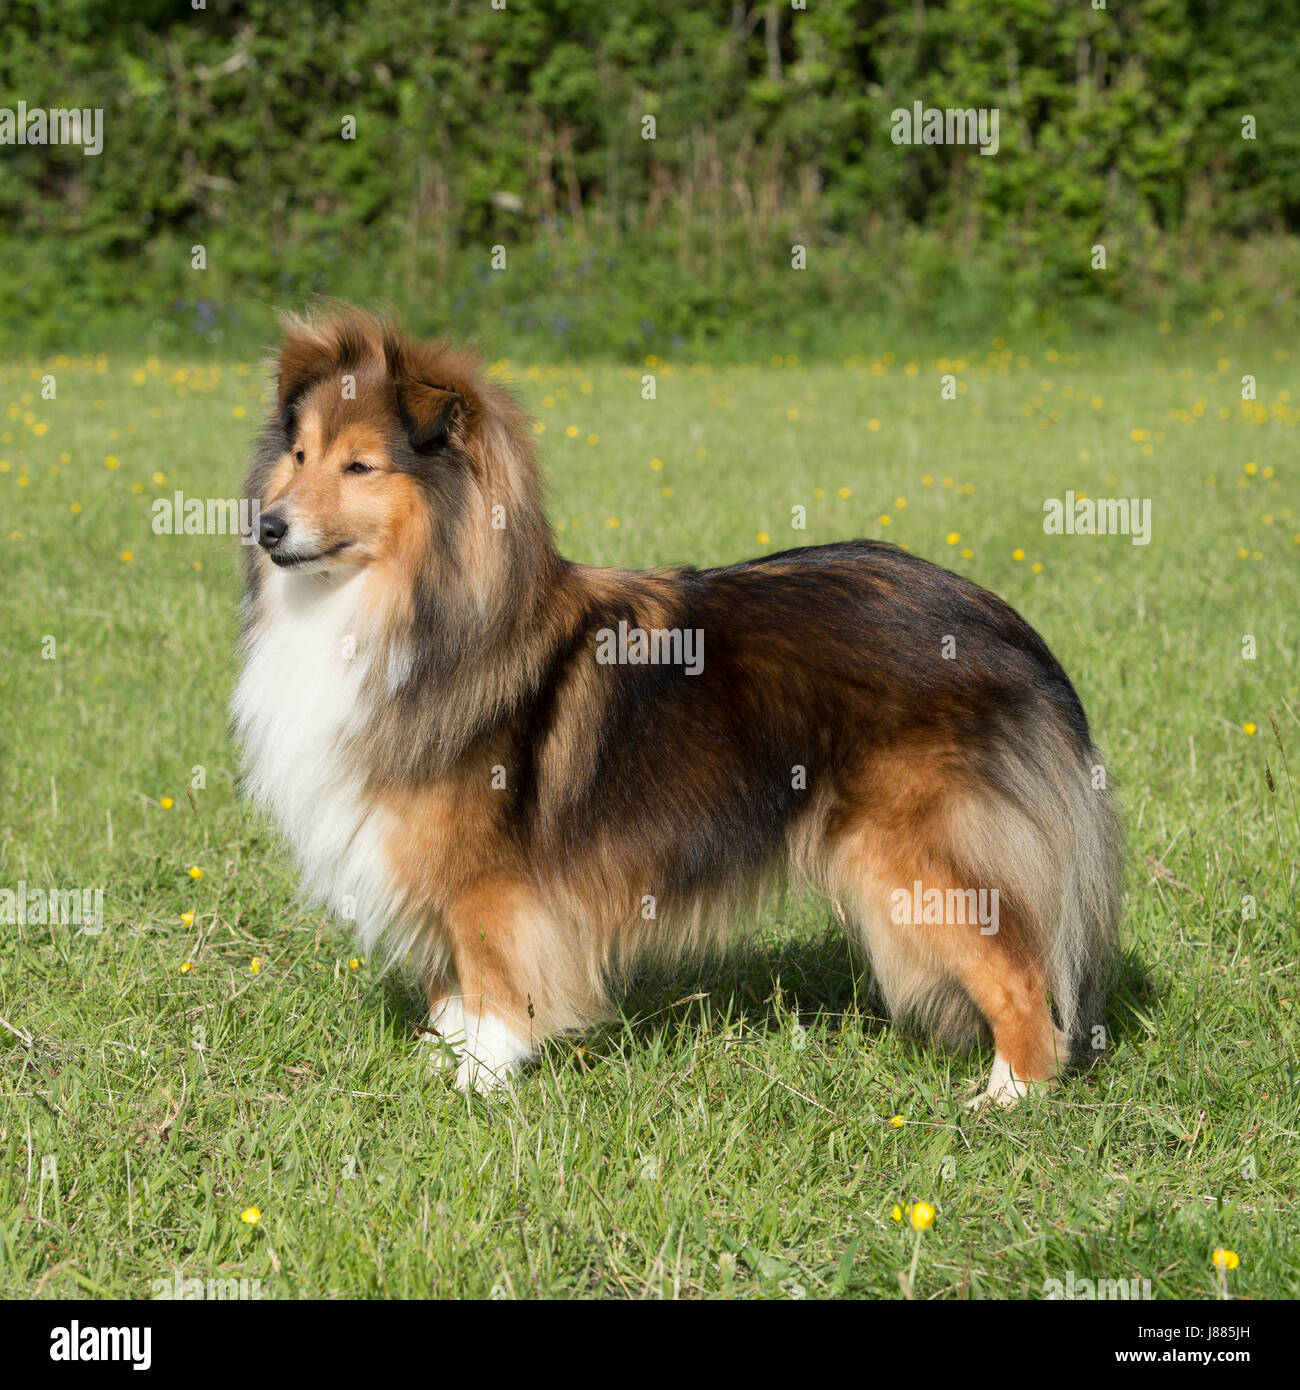 shetland sheep dog - Stock Image